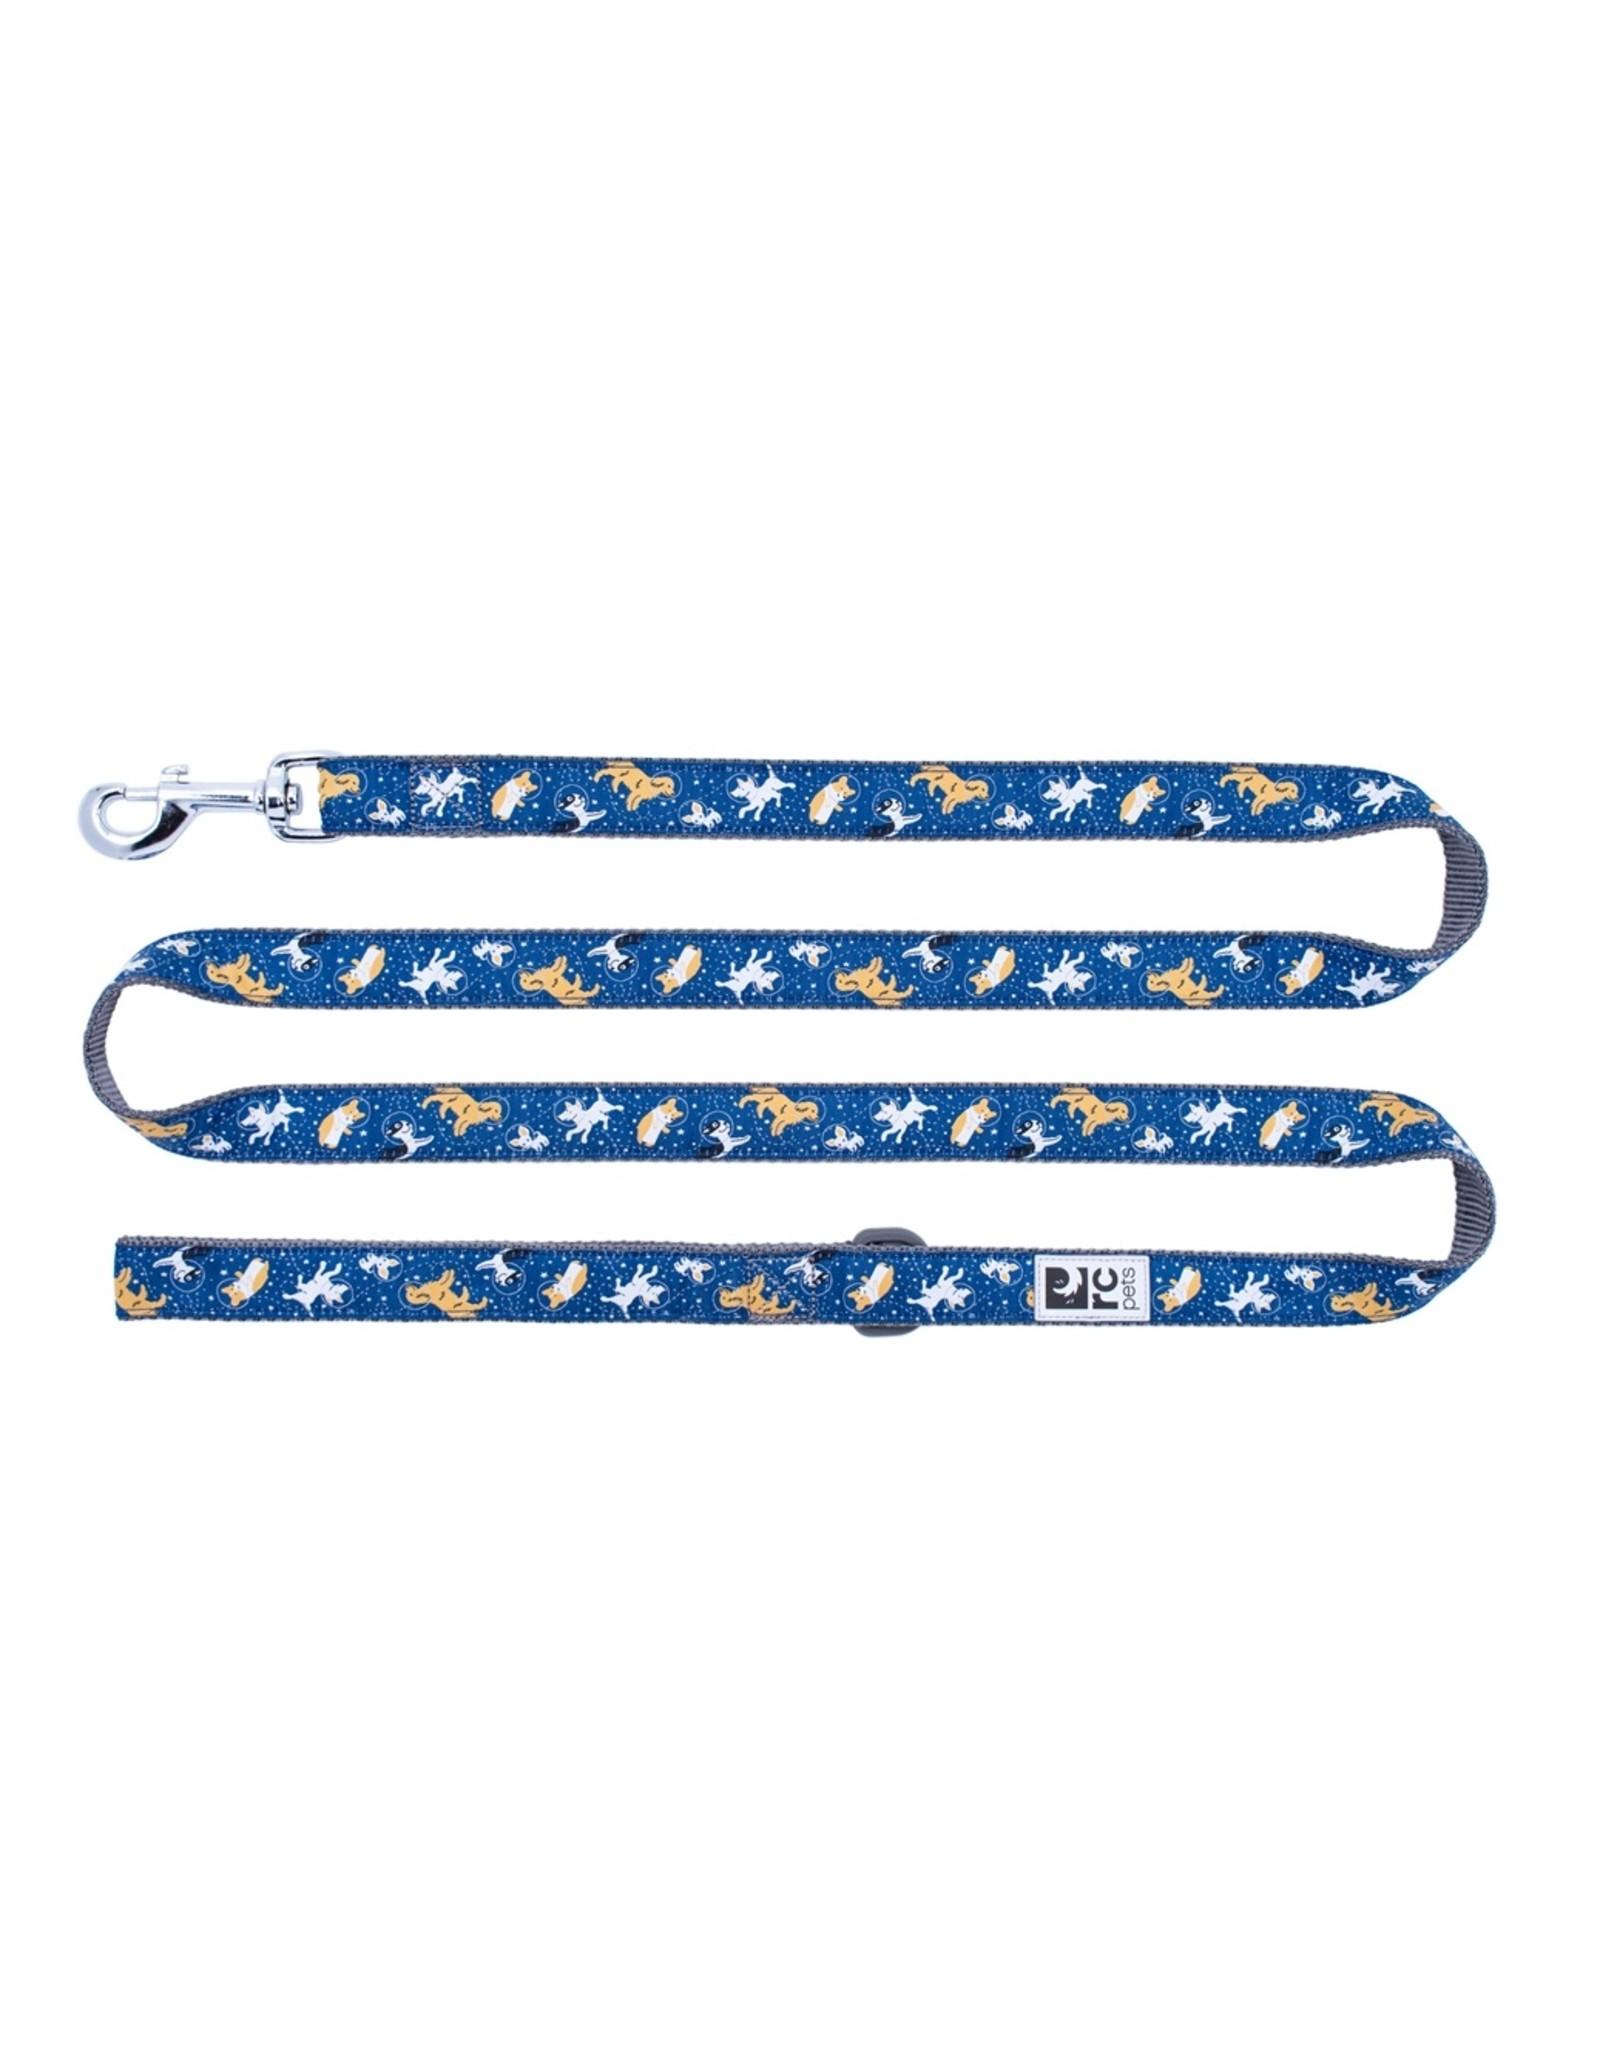 RC Pet Products RC Pets Original Designs Dog Lead 6ft